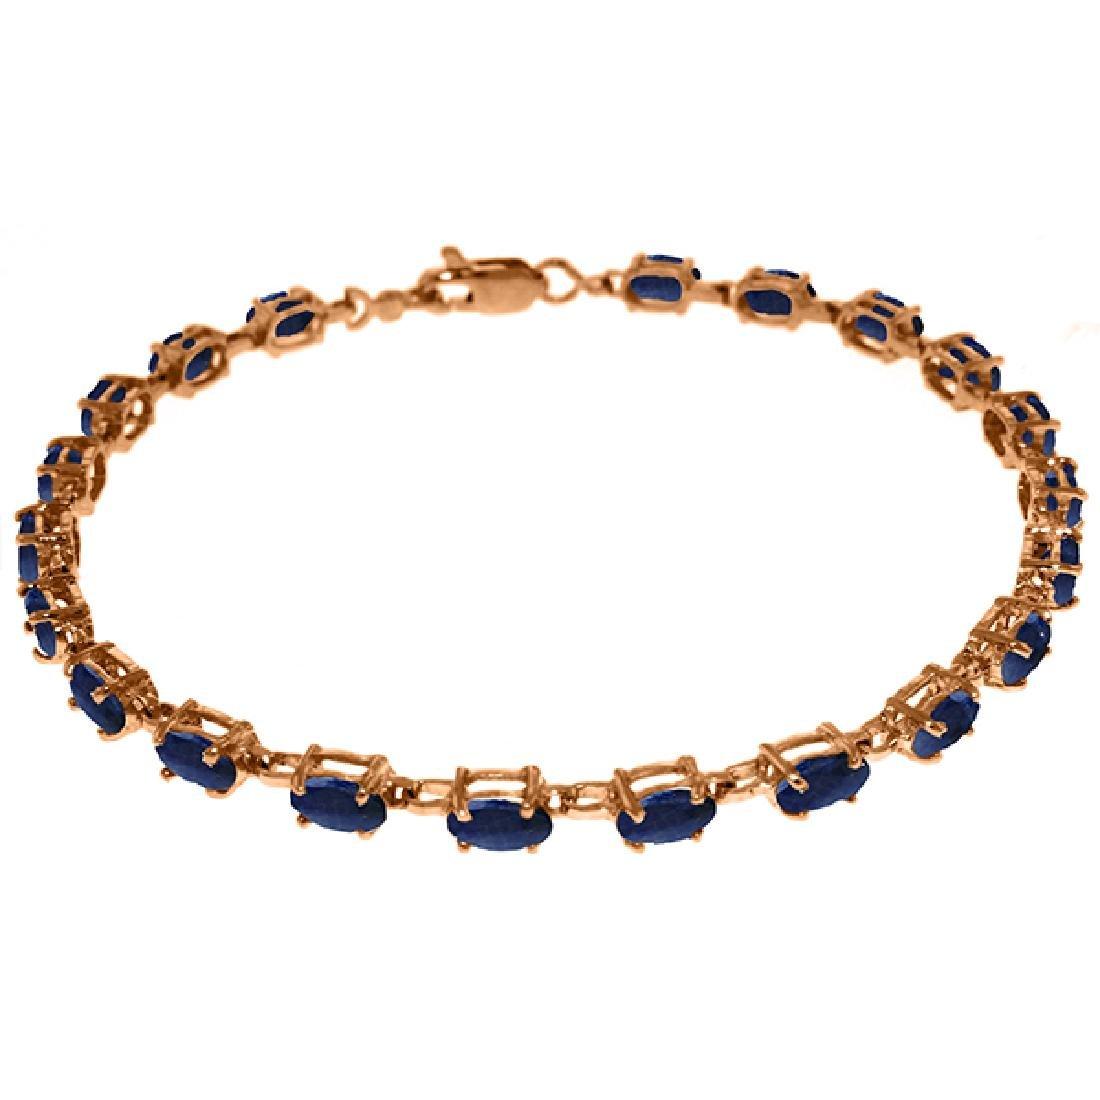 Genuine 8 ctw Sapphire Bracelet Jewelry 14KT Rose Gold